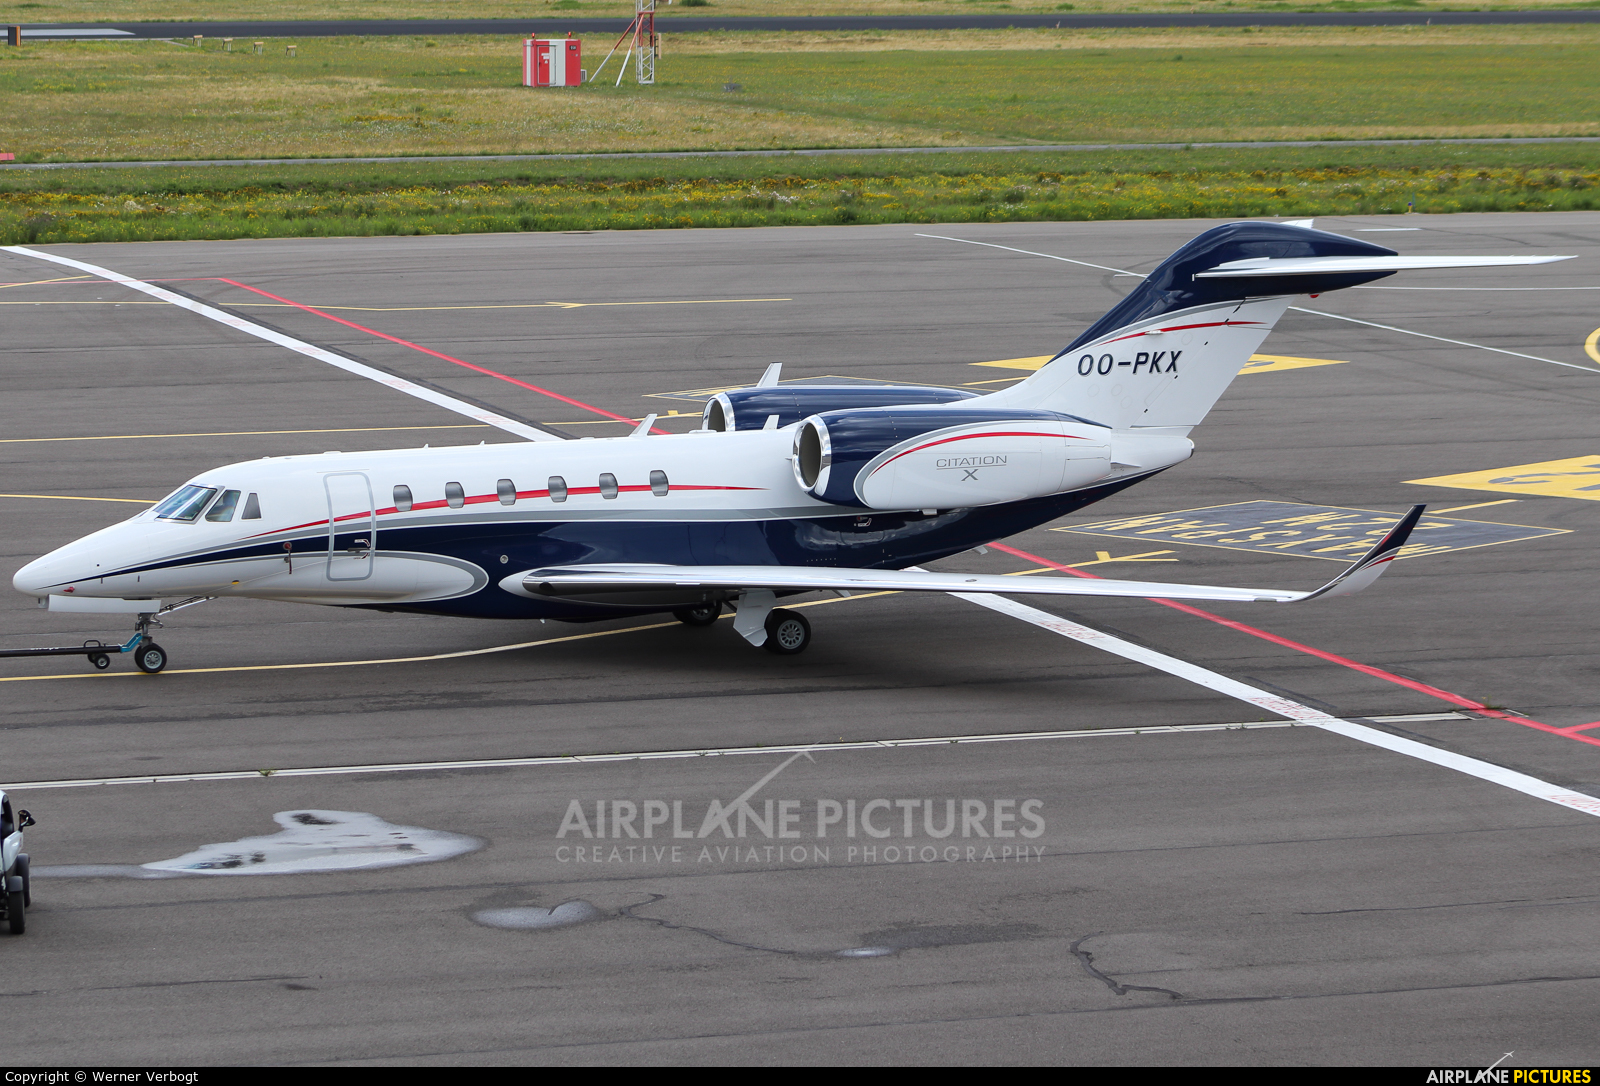 Air Service Liege OO-PKX aircraft at Eindhoven